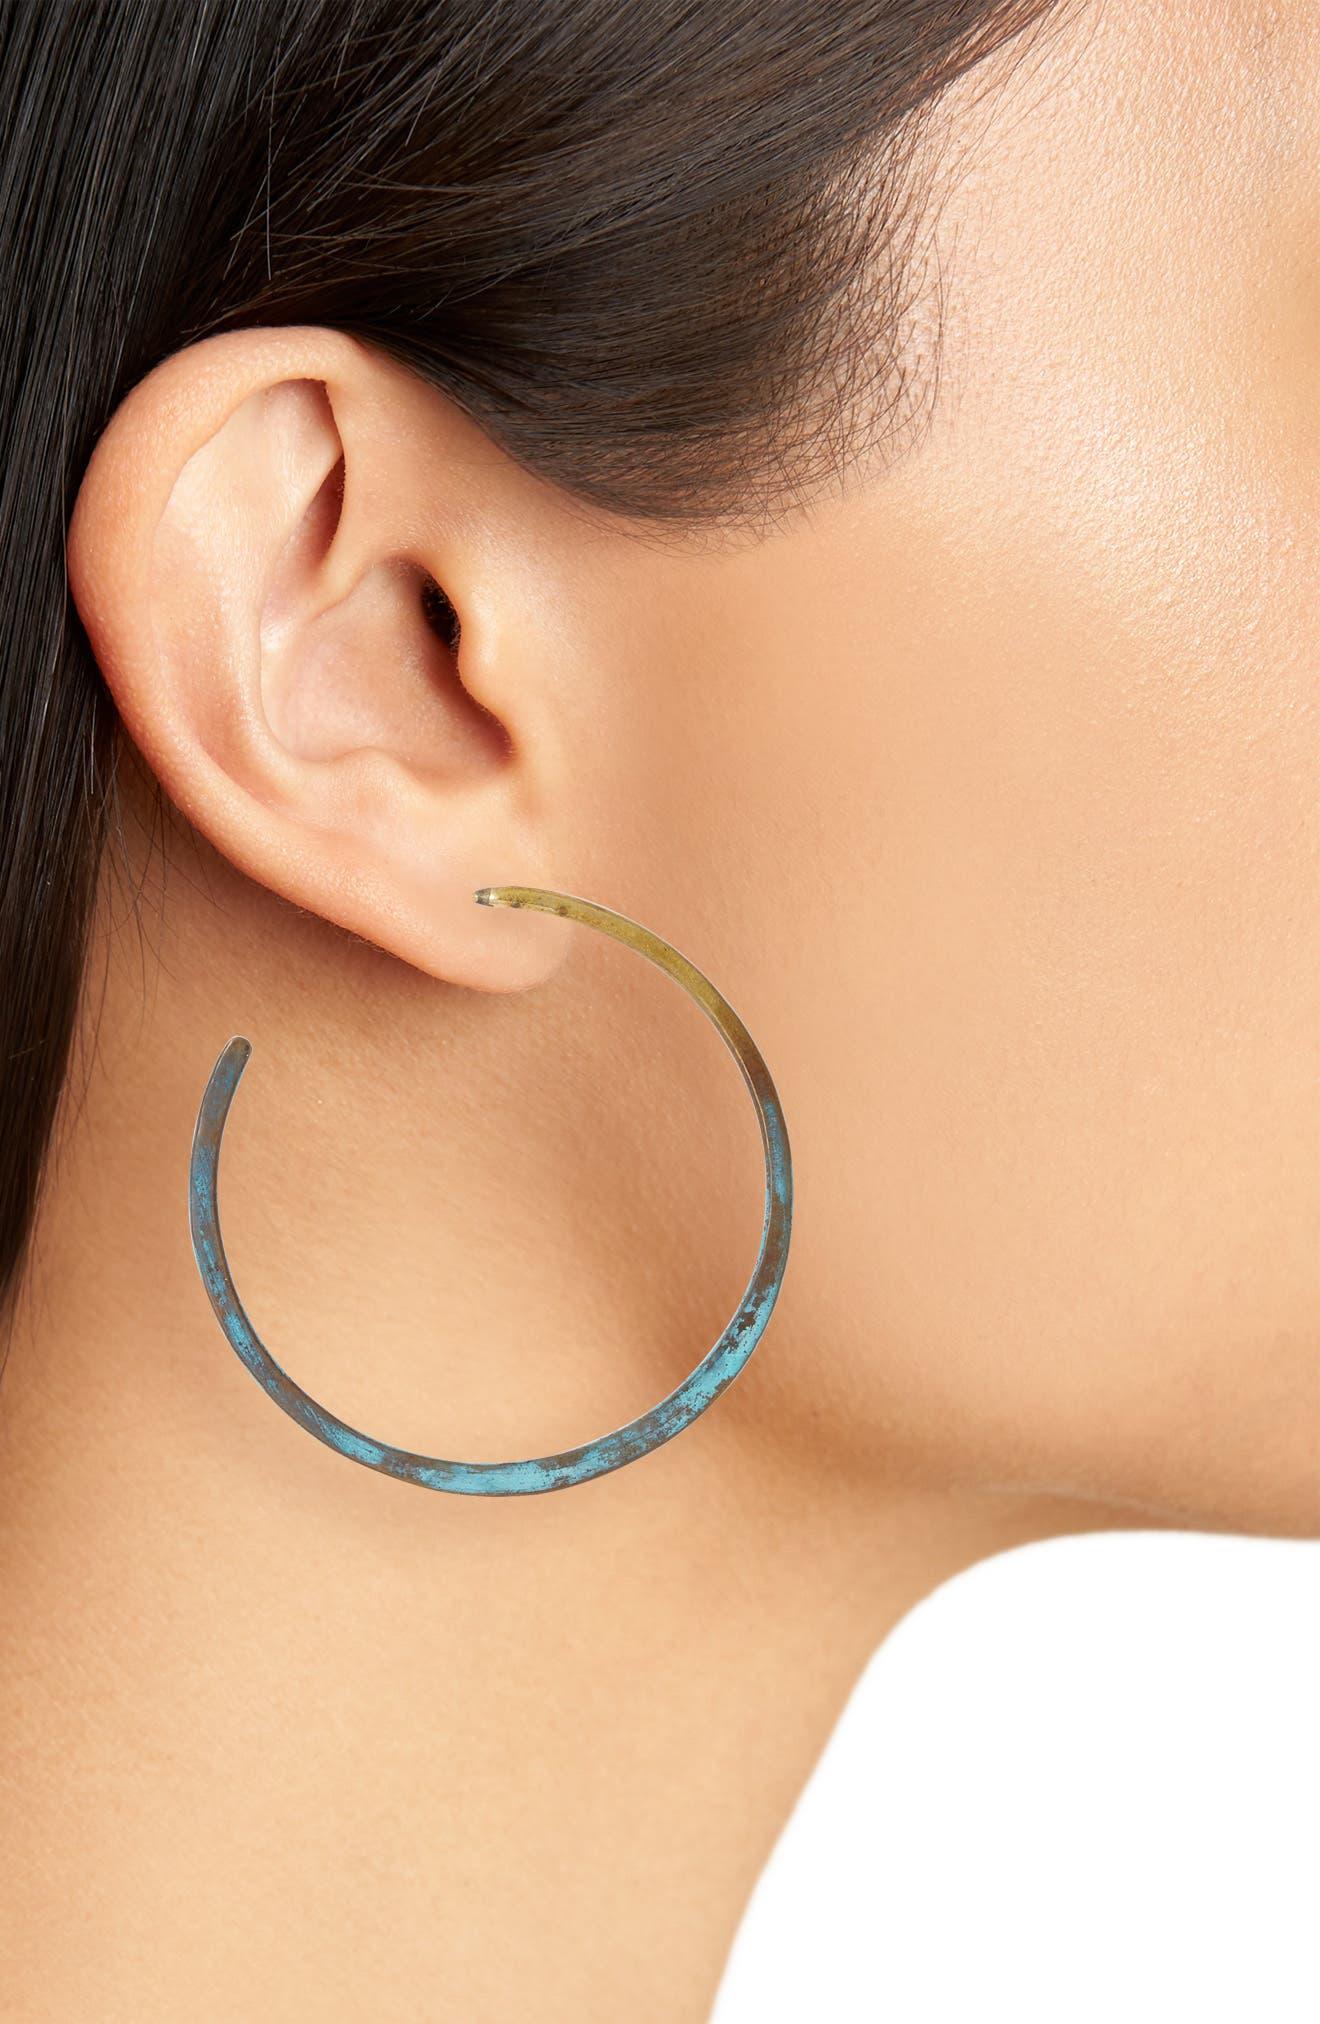 Patina Hoop Earrings,                             Alternate thumbnail 2, color,                             301